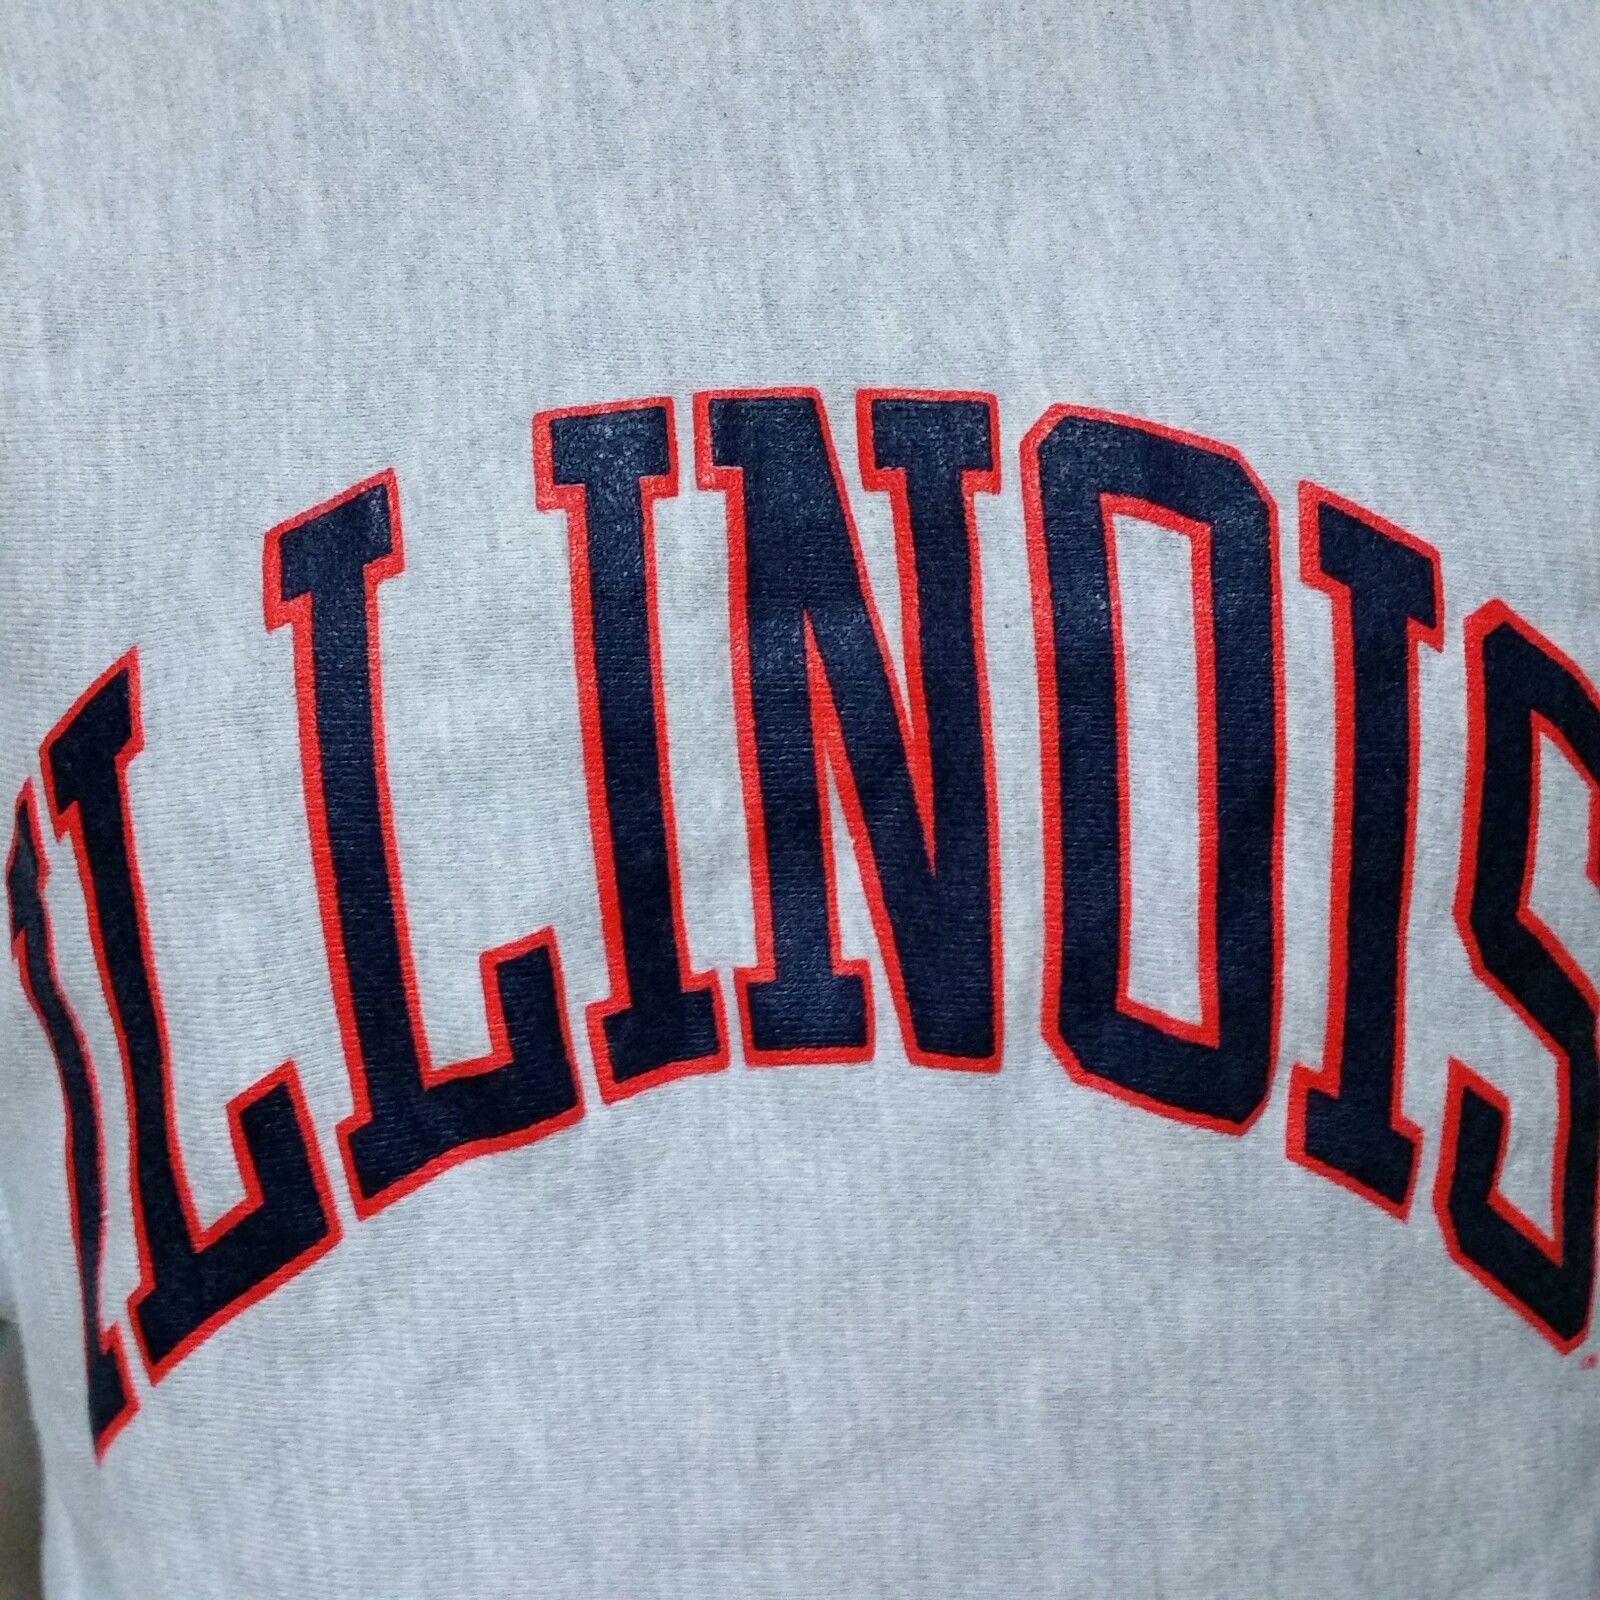 VTG Champion Reverse Weave Sweatshirt Illinois Fighting Illini 80s College XL